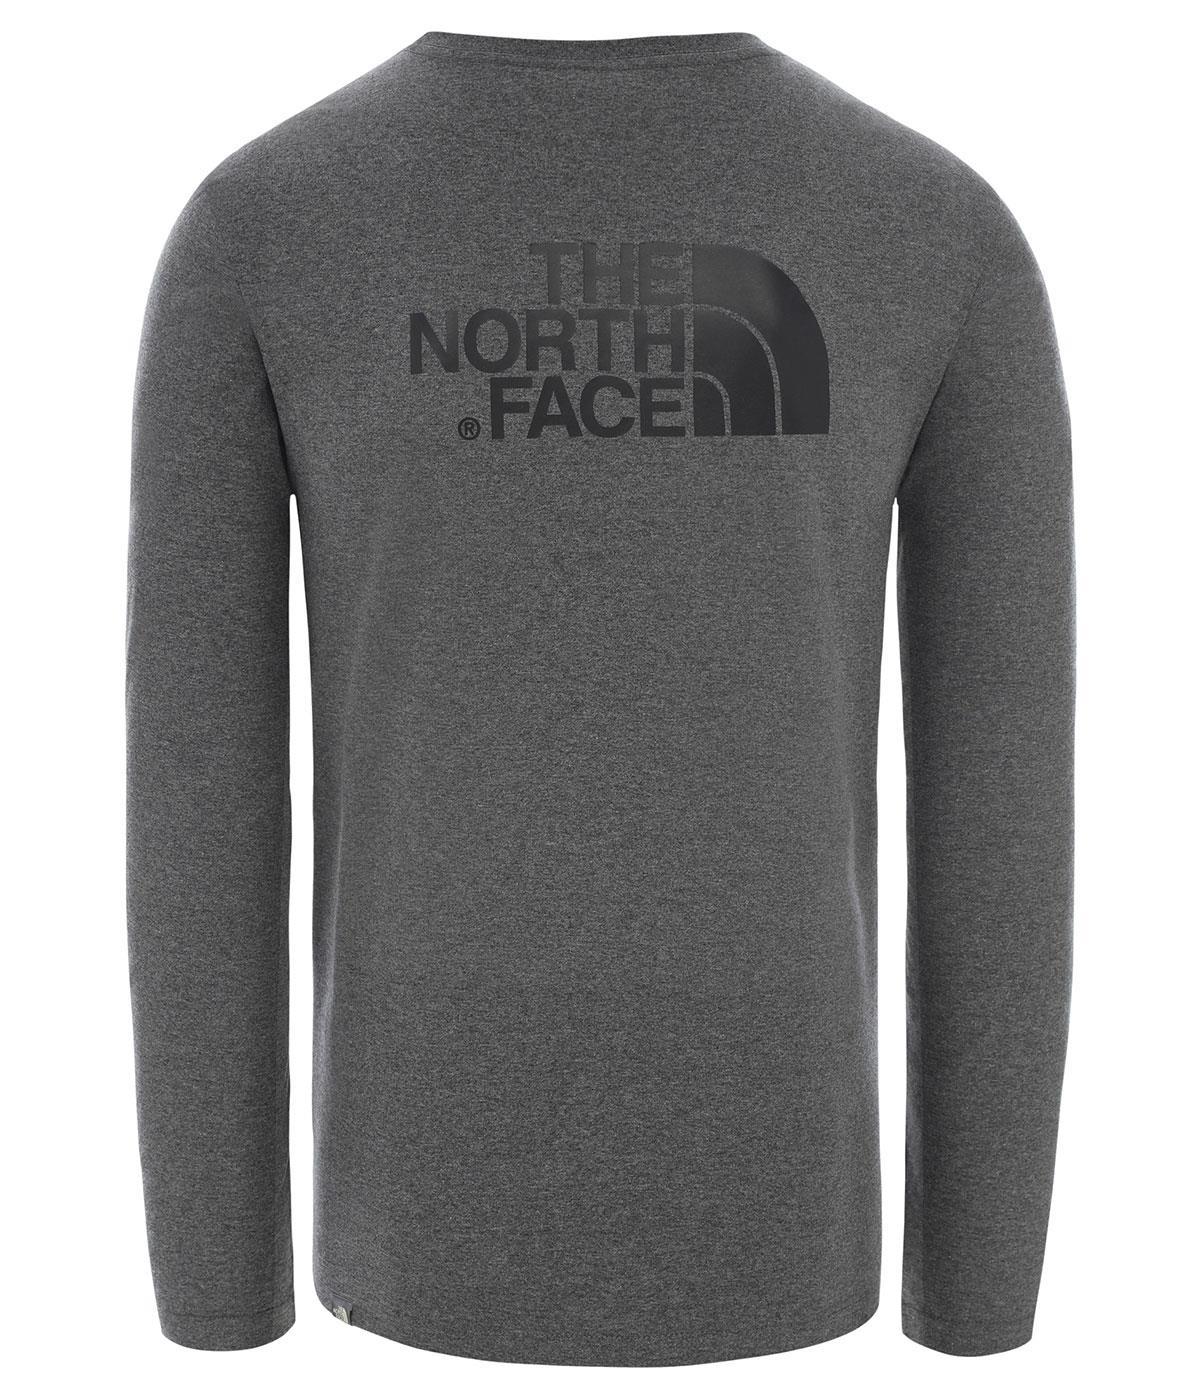 The Northface Erkek L/S EASY TEE - EU NF0A2TX1DYY1